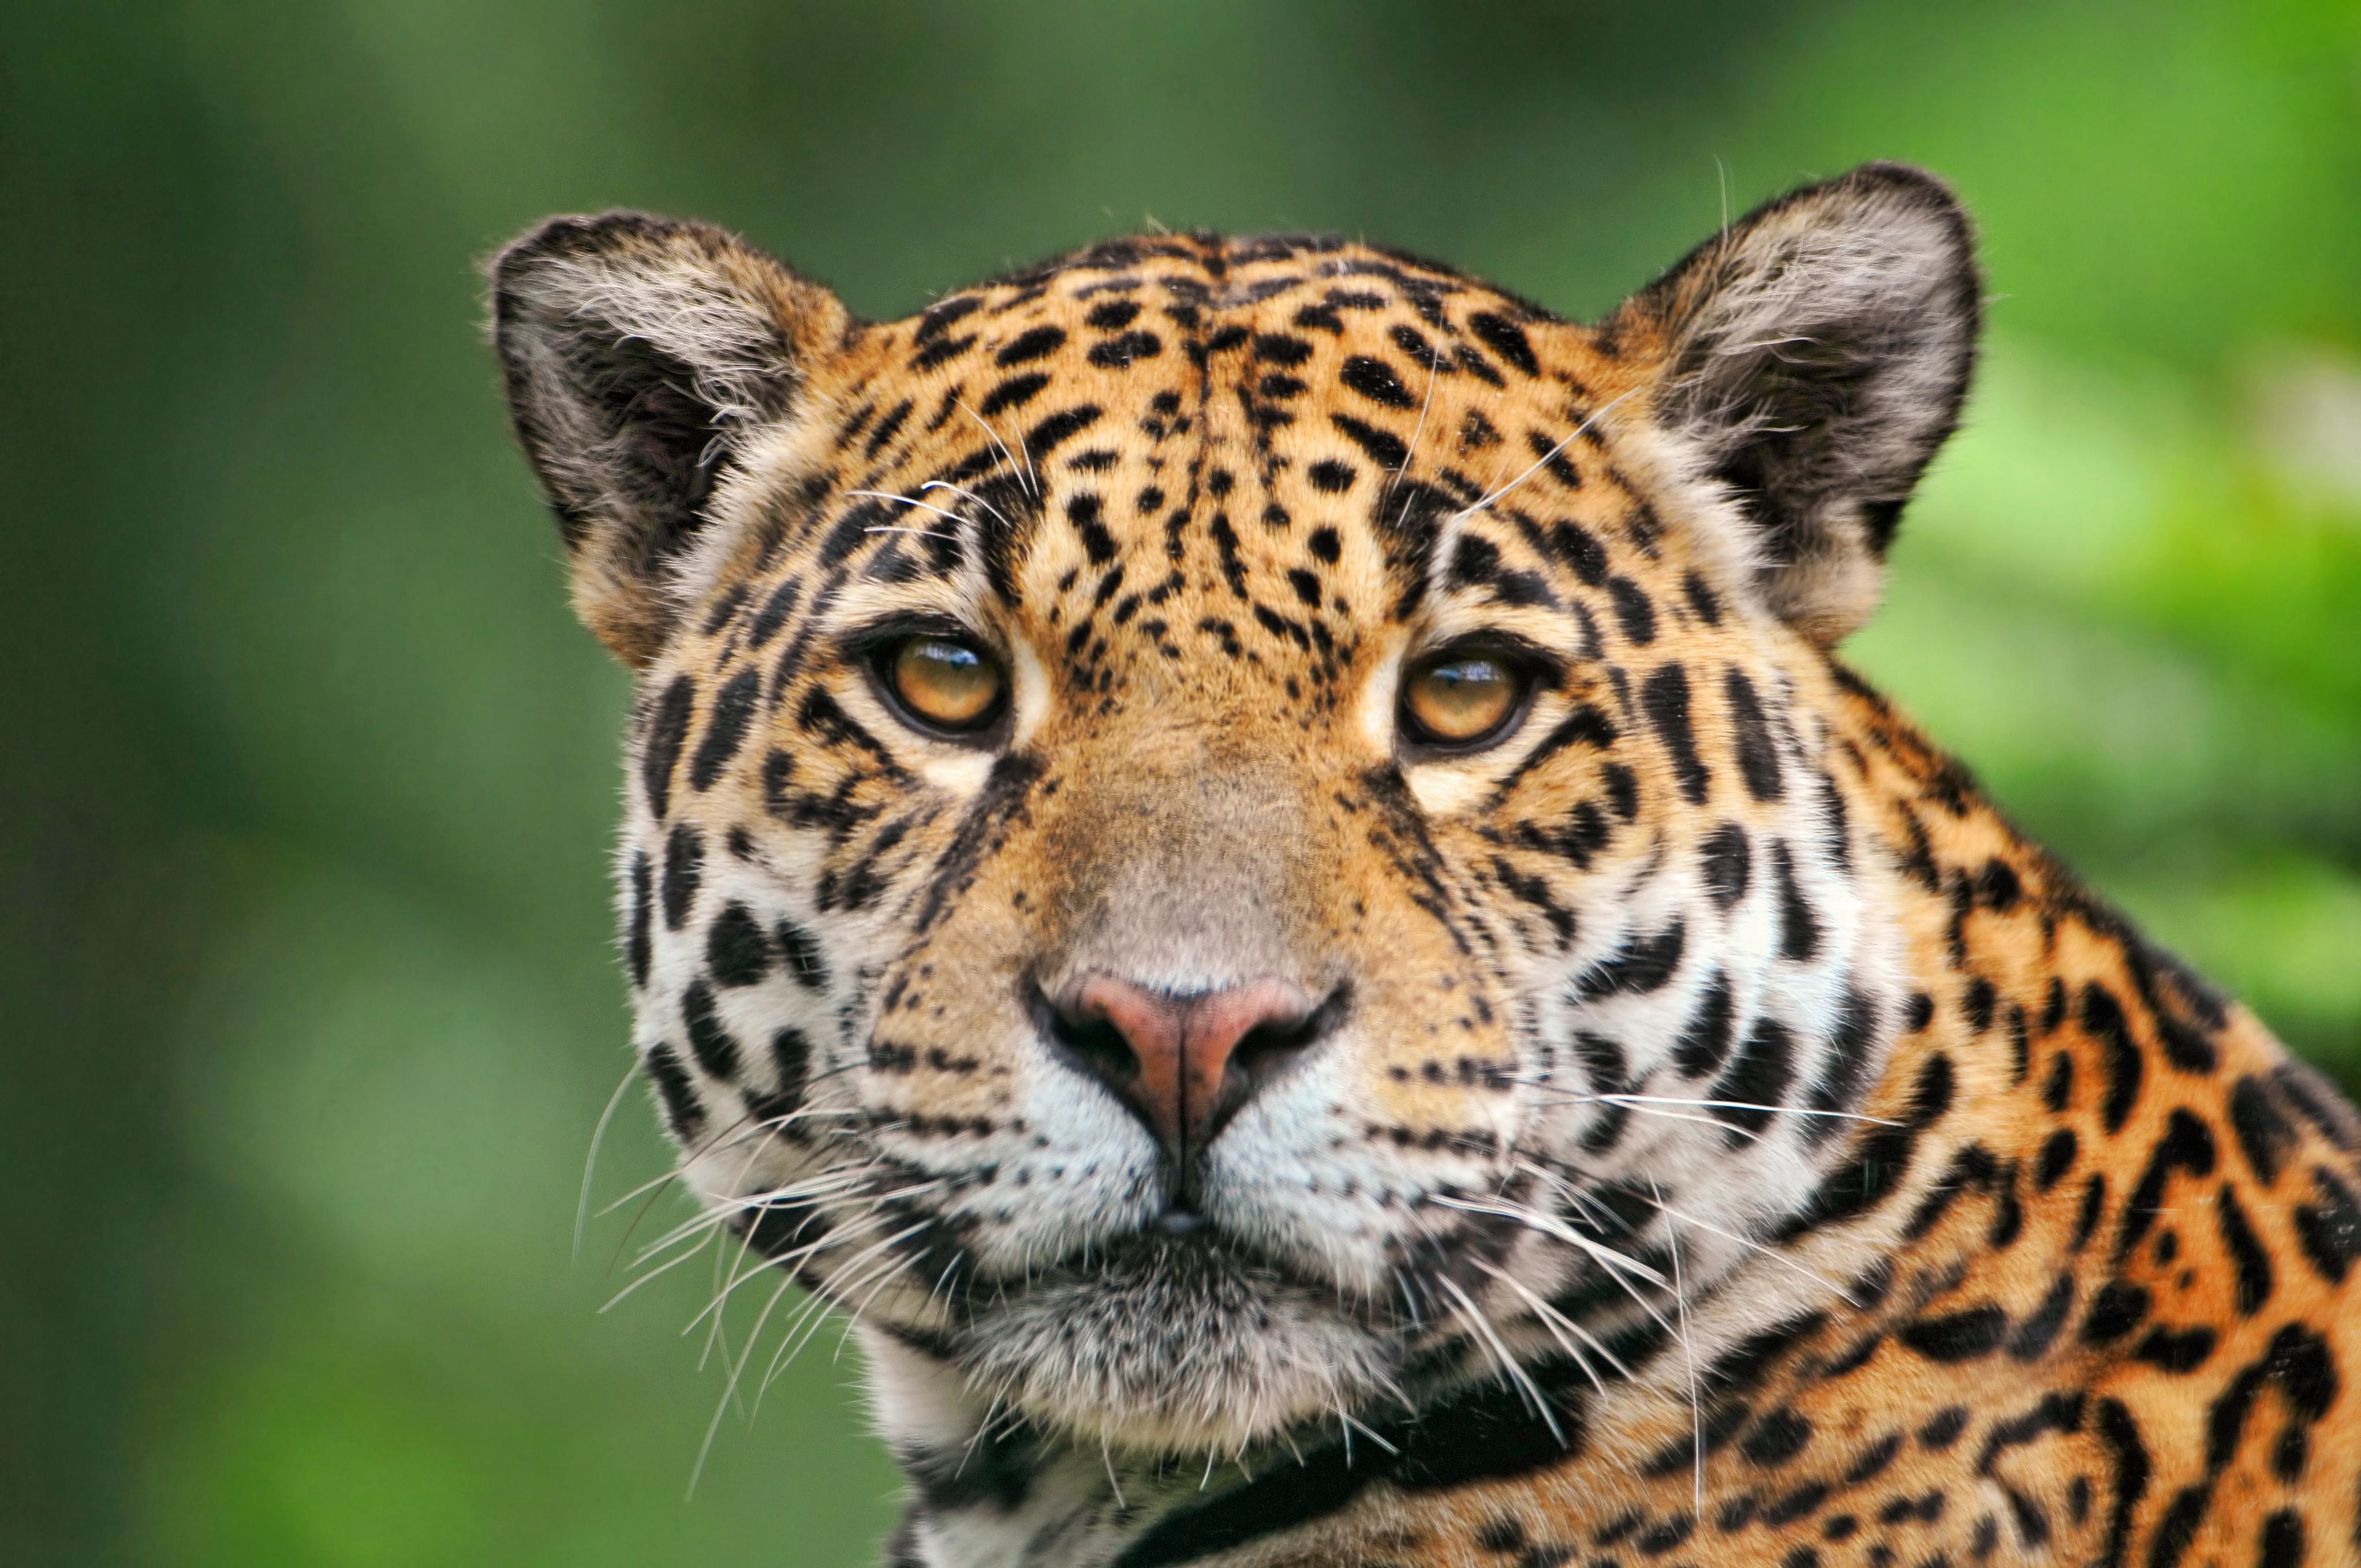 jaguar animal wikimini l 39 encyclop die pour enfants. Black Bedroom Furniture Sets. Home Design Ideas